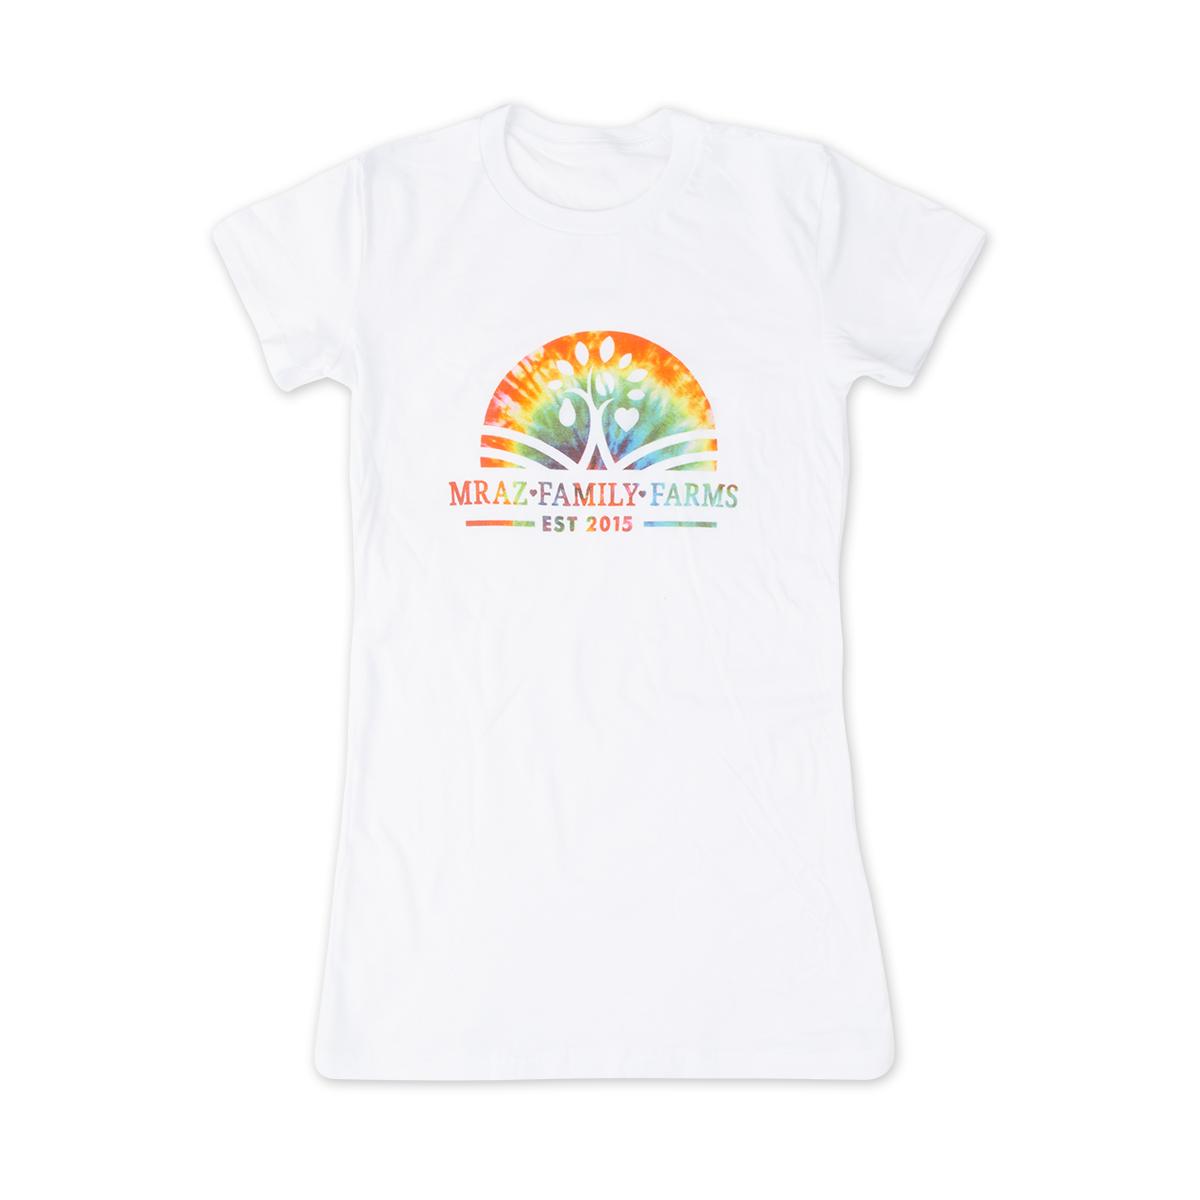 Mraz Family Farms Womens Rainbow T-shirt